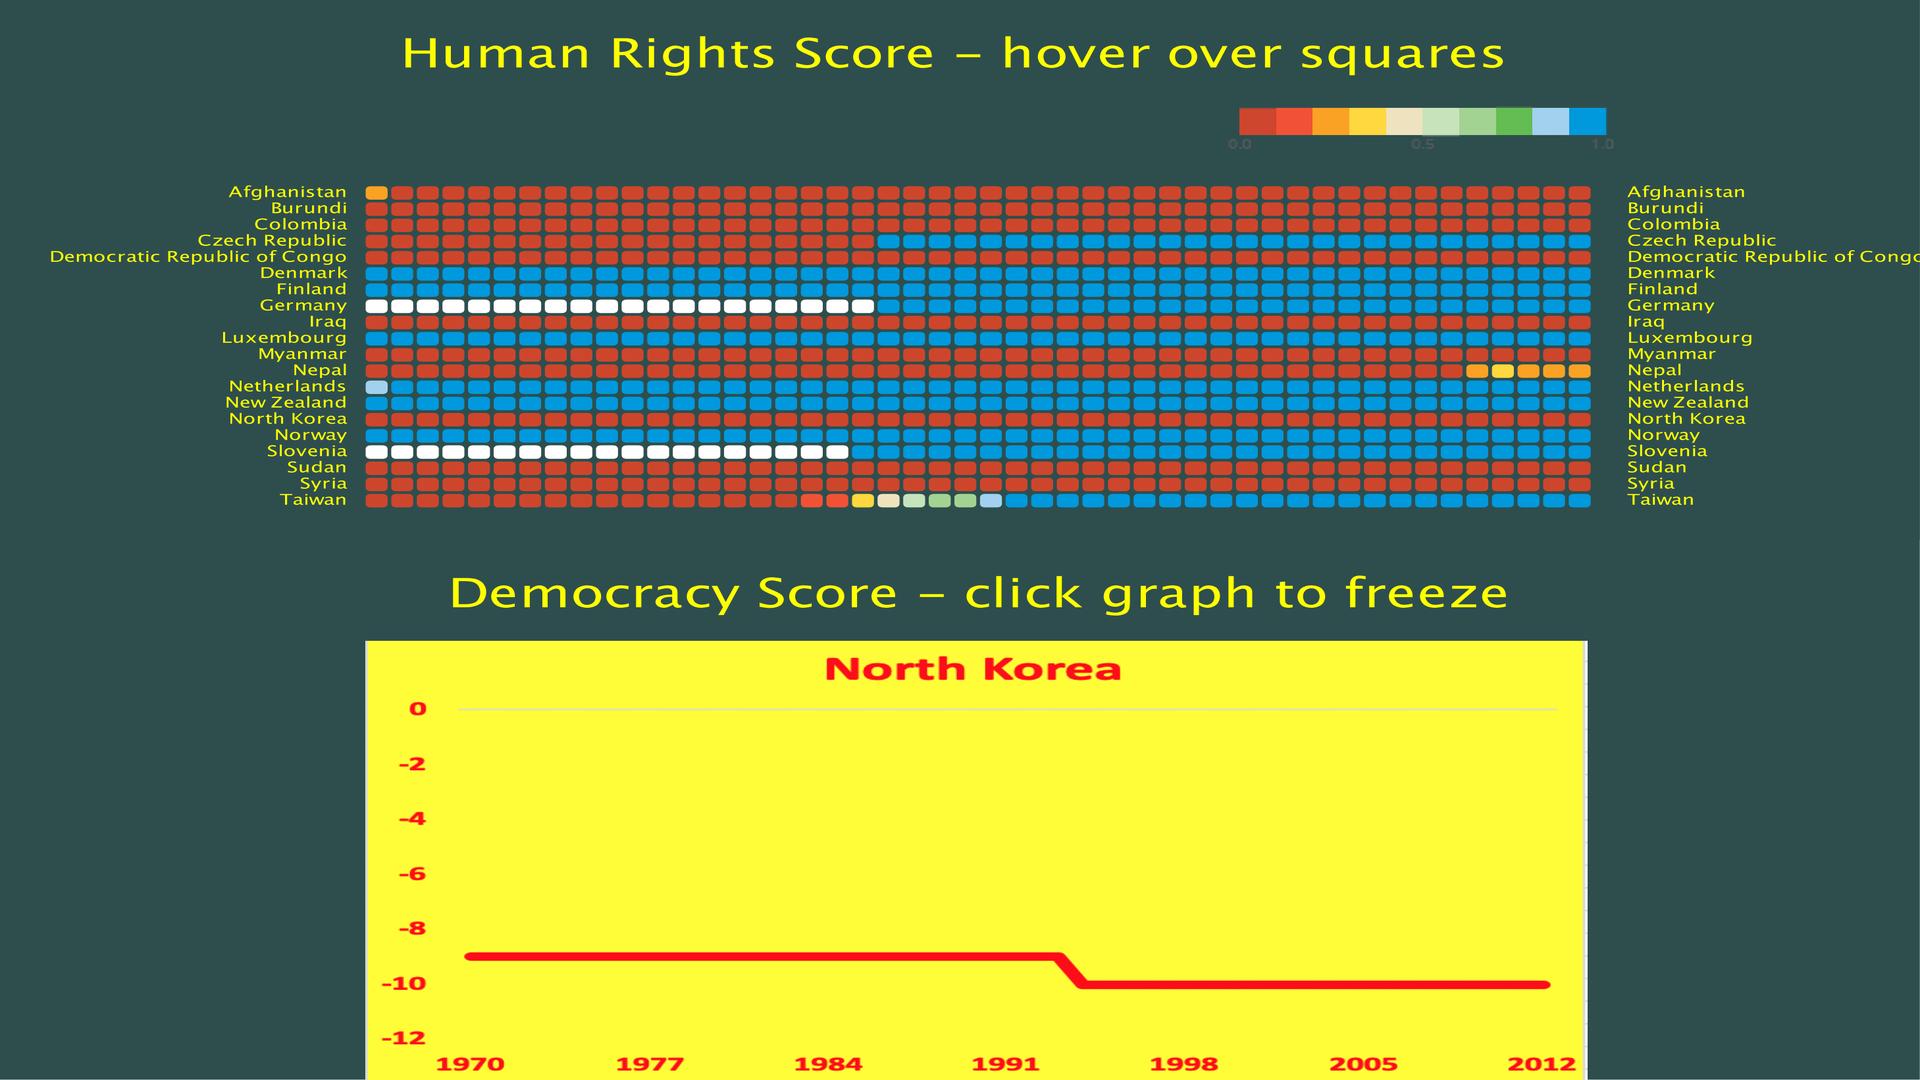 rsz_1democracyandhumanrightsnorthkorea-1